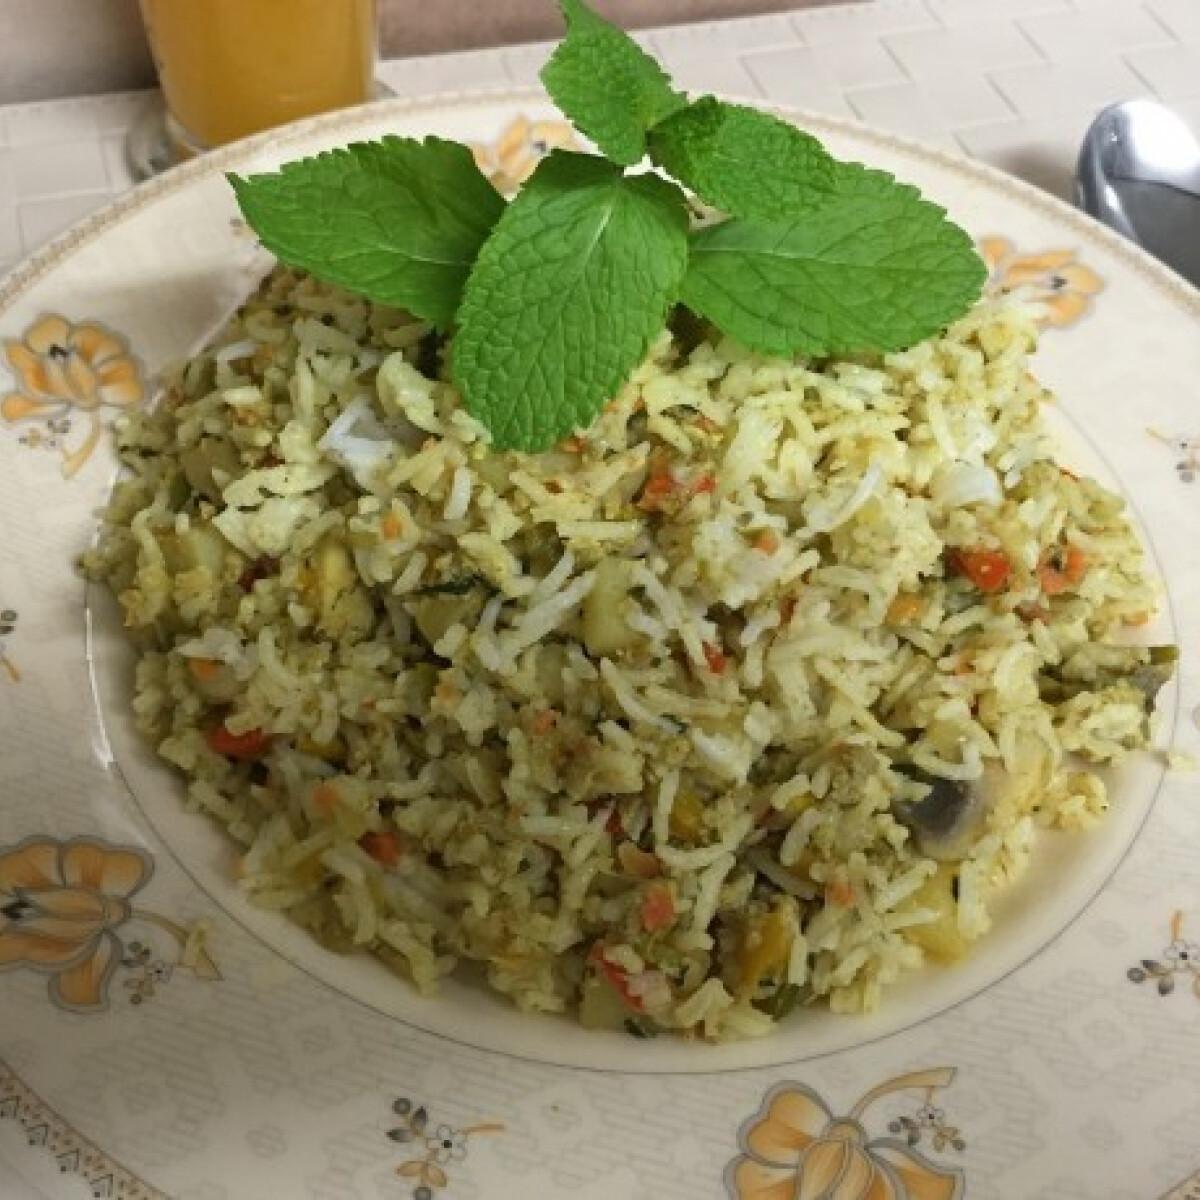 Ezen a képen: Kadhai fried pulao